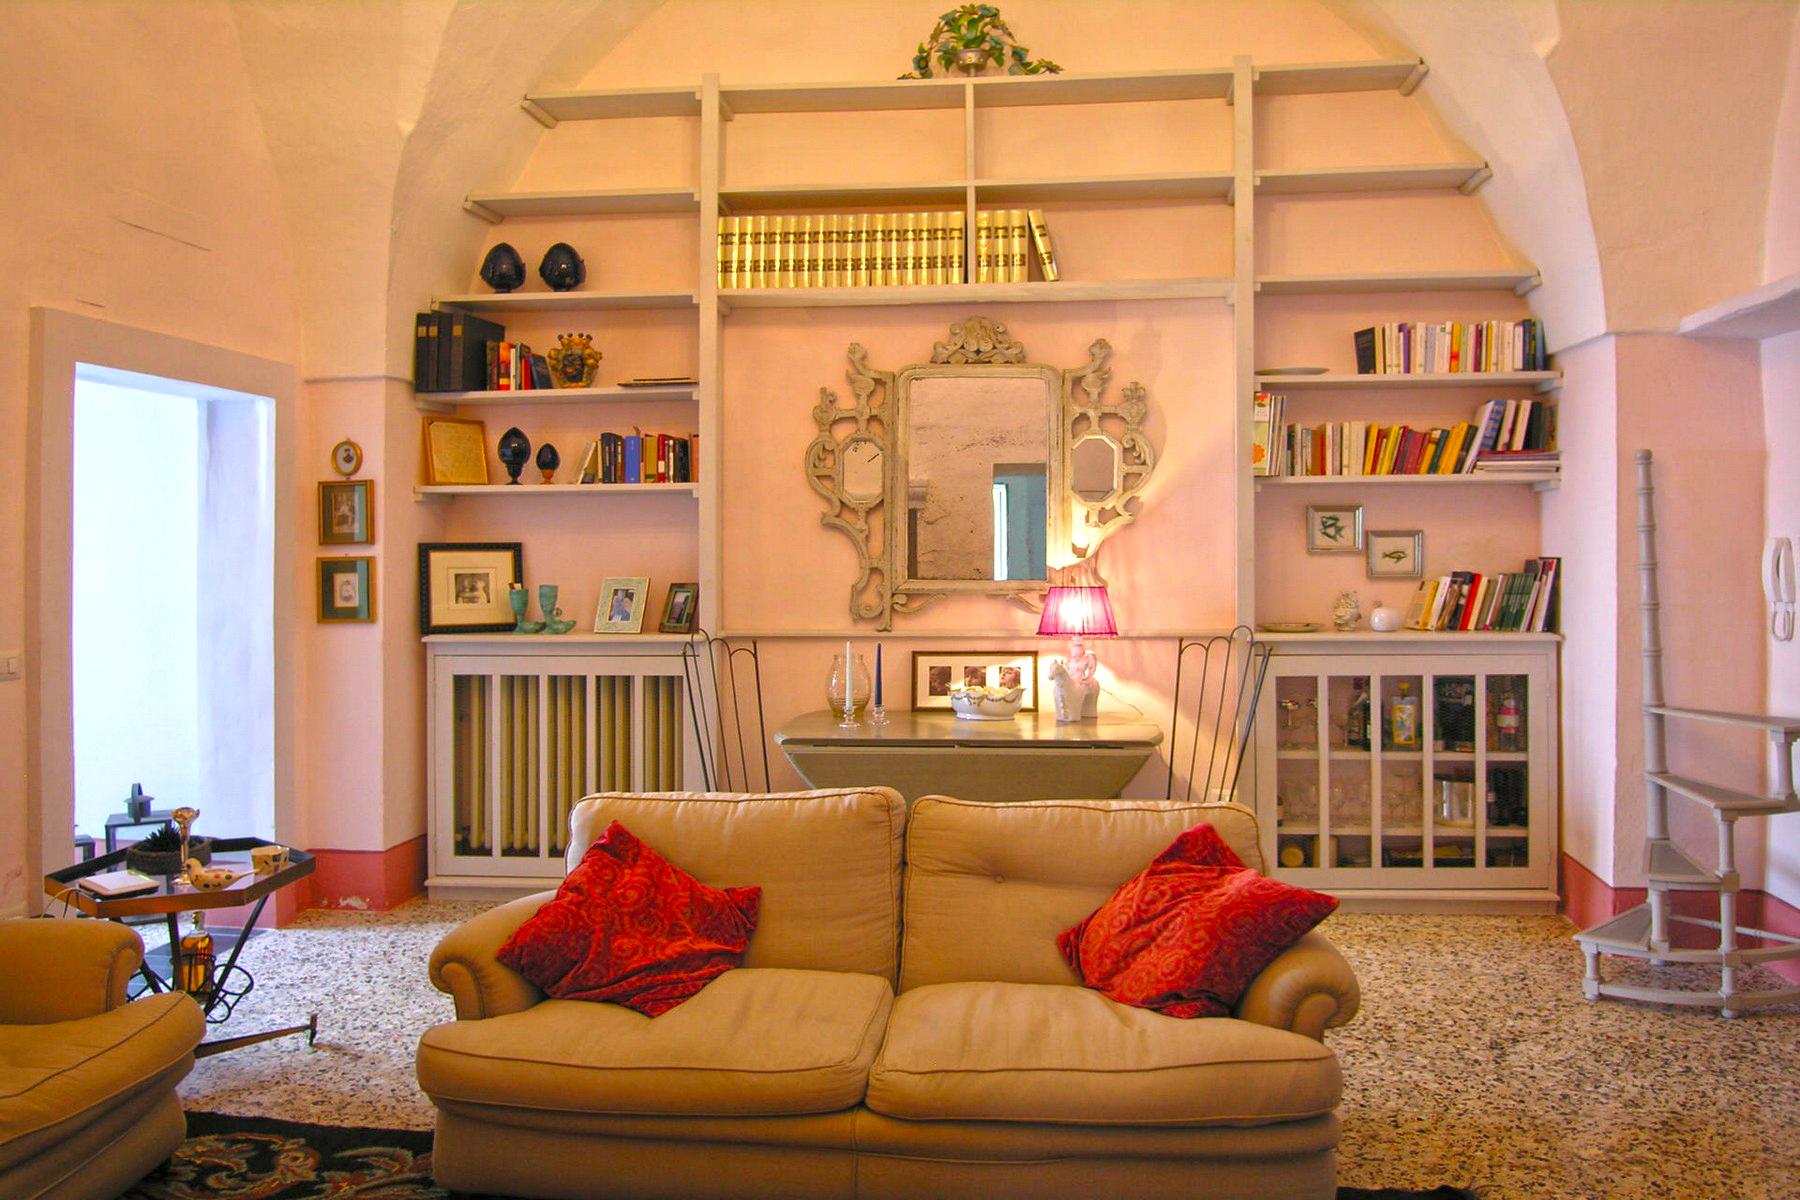 Casa indipendente in Vendita a Ortelle: 5 locali, 200 mq